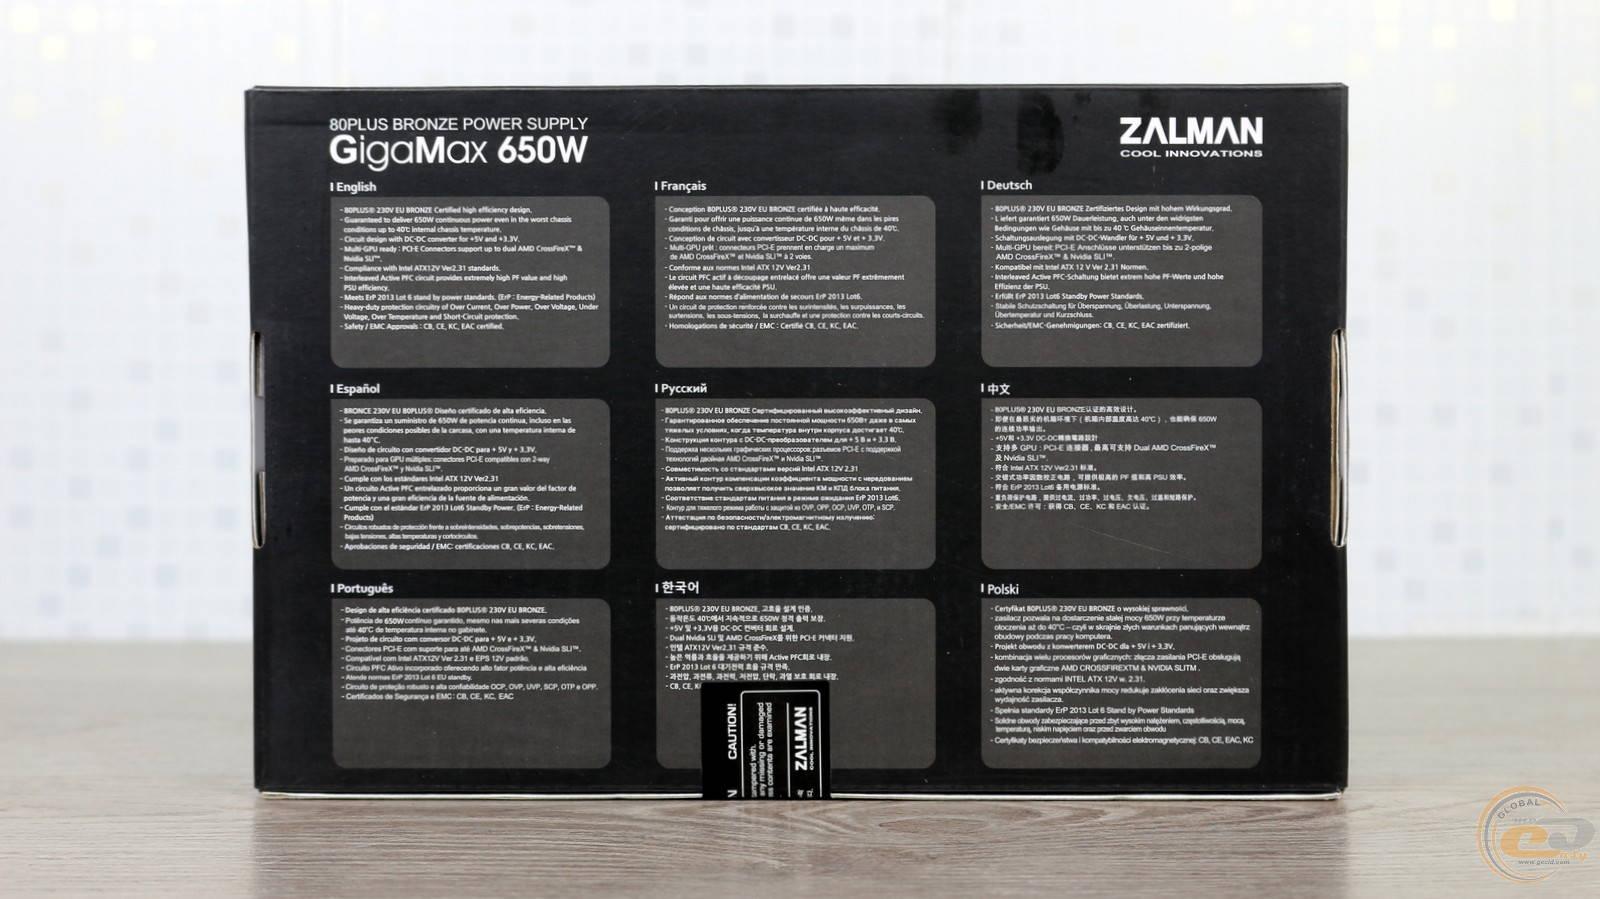 Блок питания Zalman GigaMax 650W. Фото 3